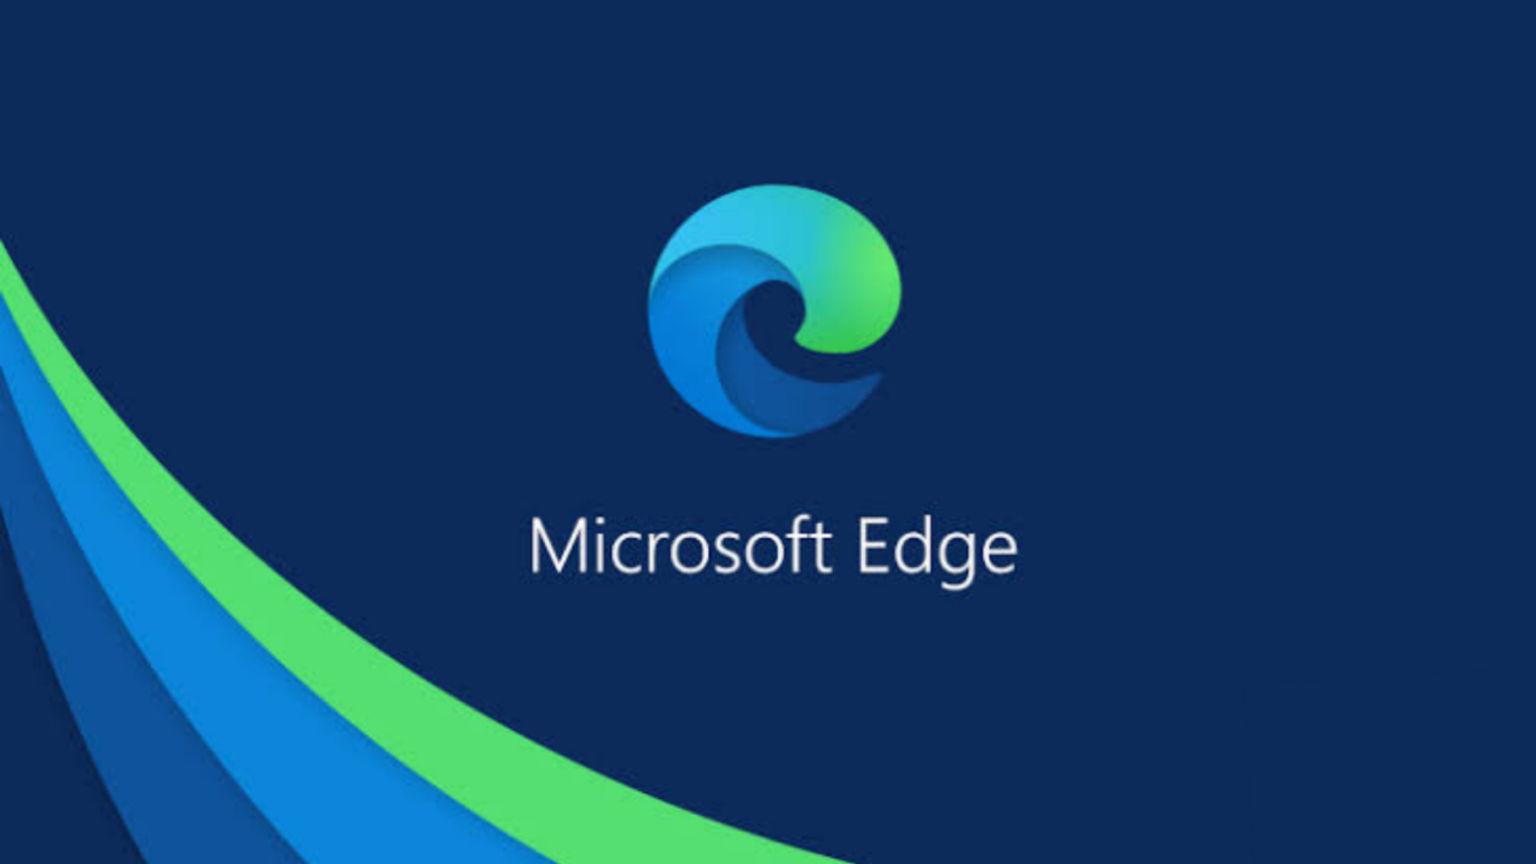 Microsoft Edge-এর নতুন Logo উন্মোচন এবং Build-in Game পরিবর্তন করা হয়েছে